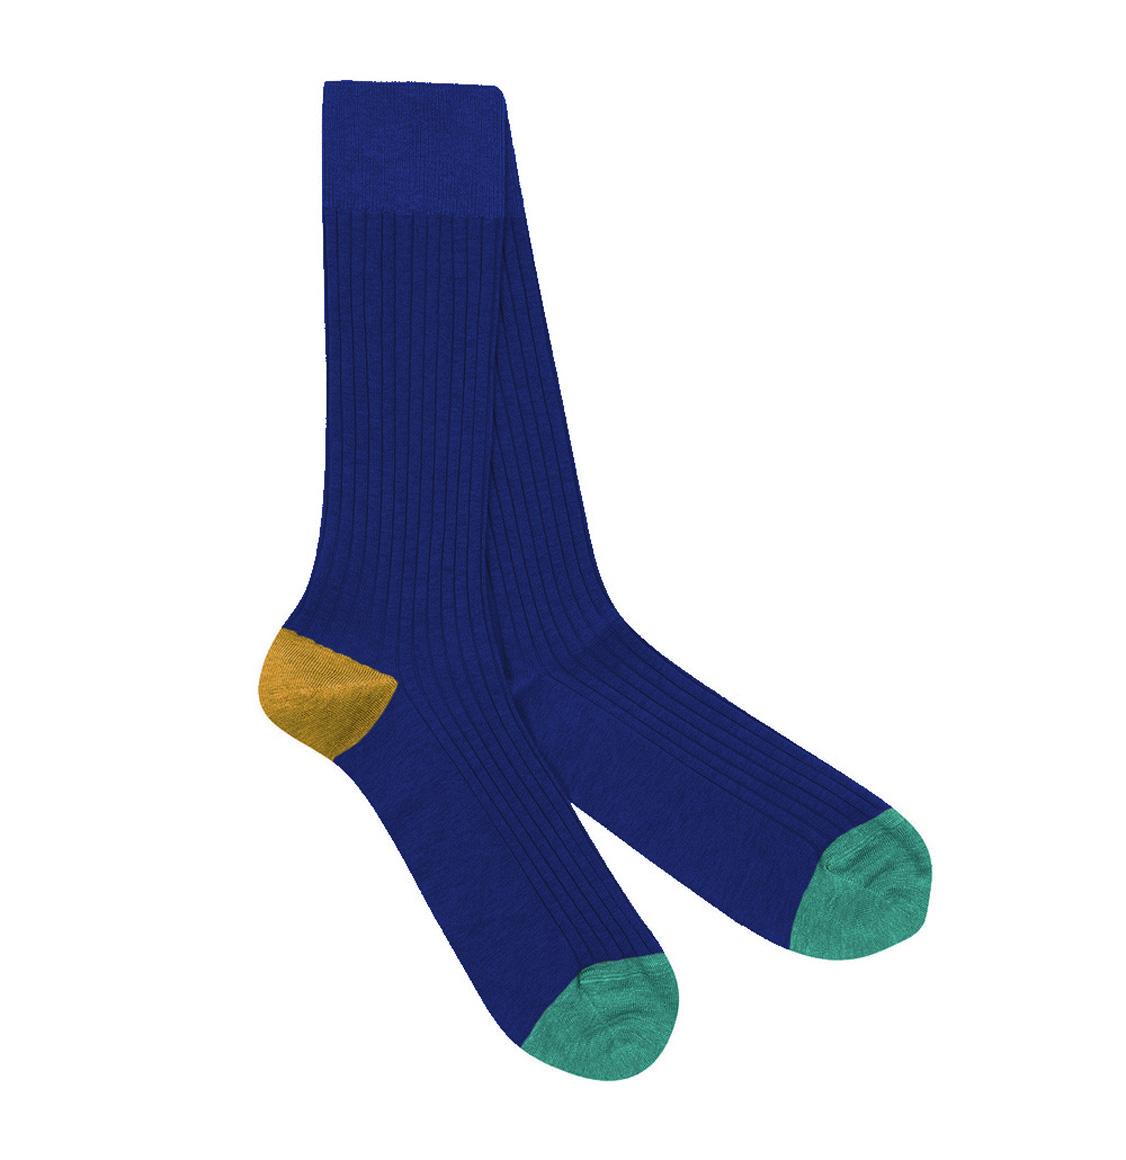 Pantherella Socks Portobello Ultramarine